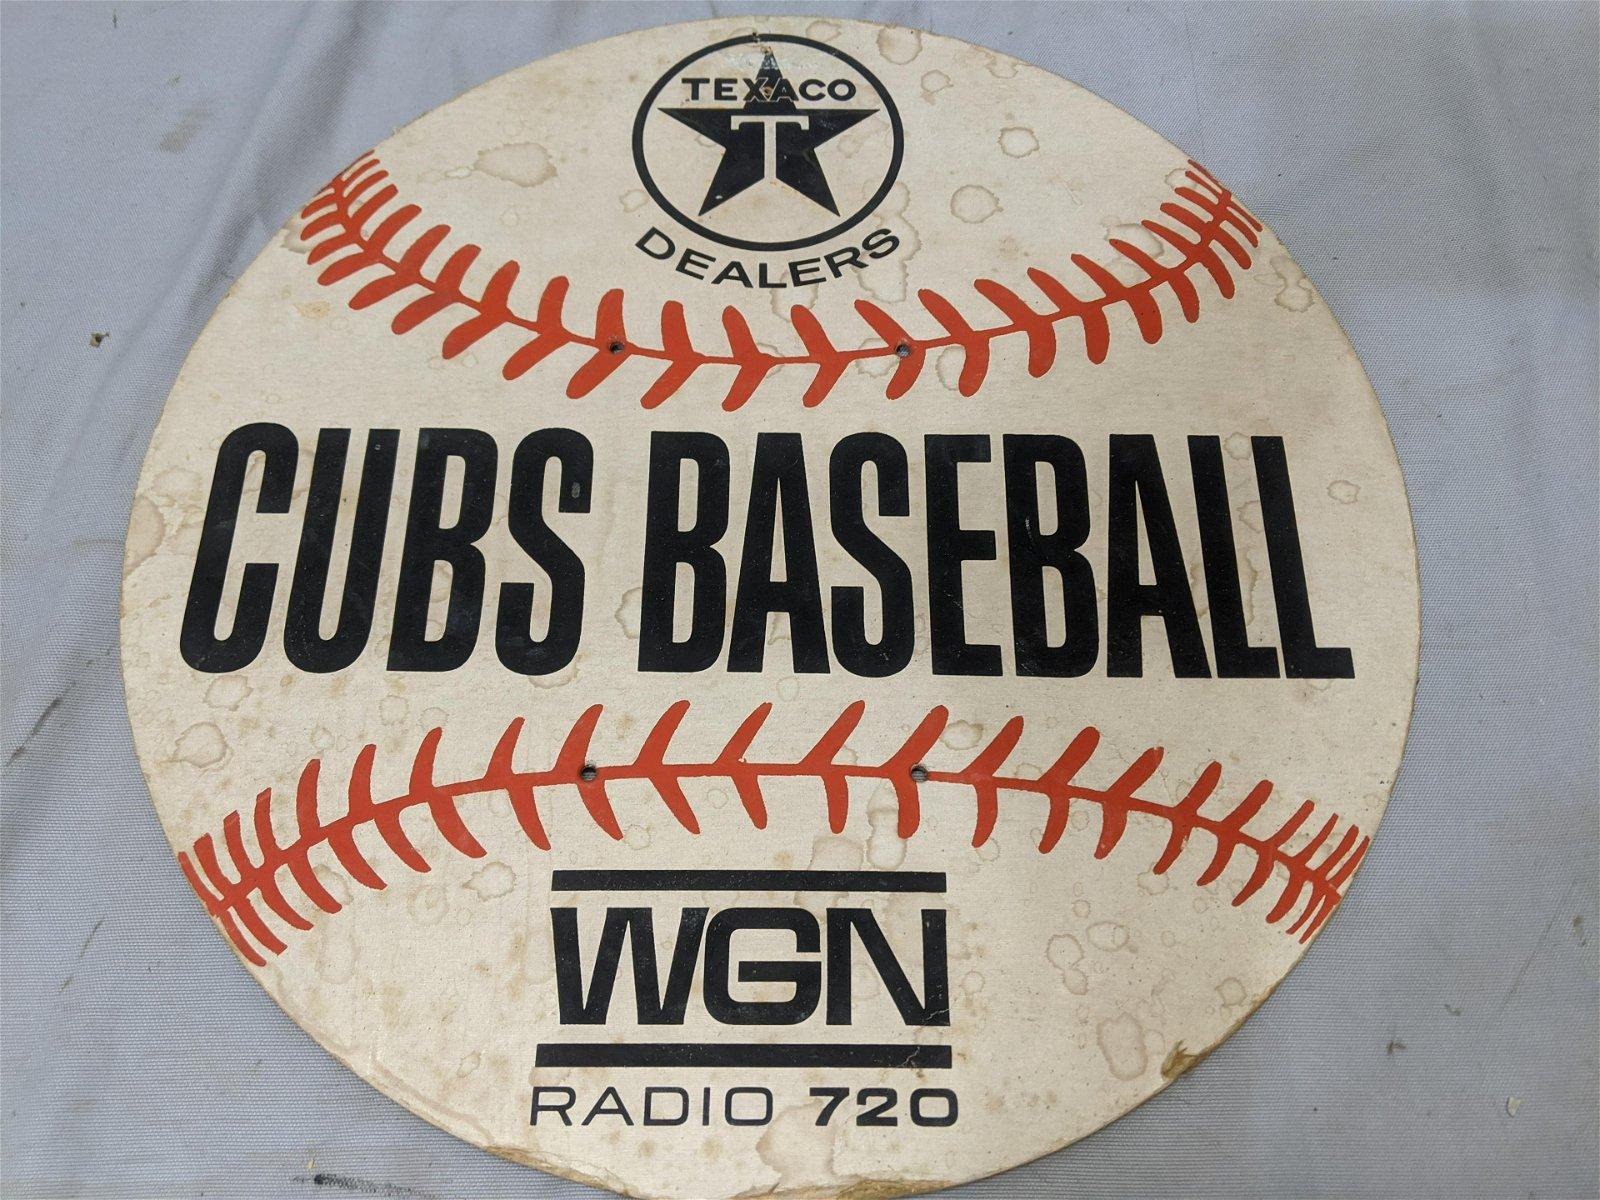 Vintage Texaco Gas Station Chicago Cubs Baseball Sign